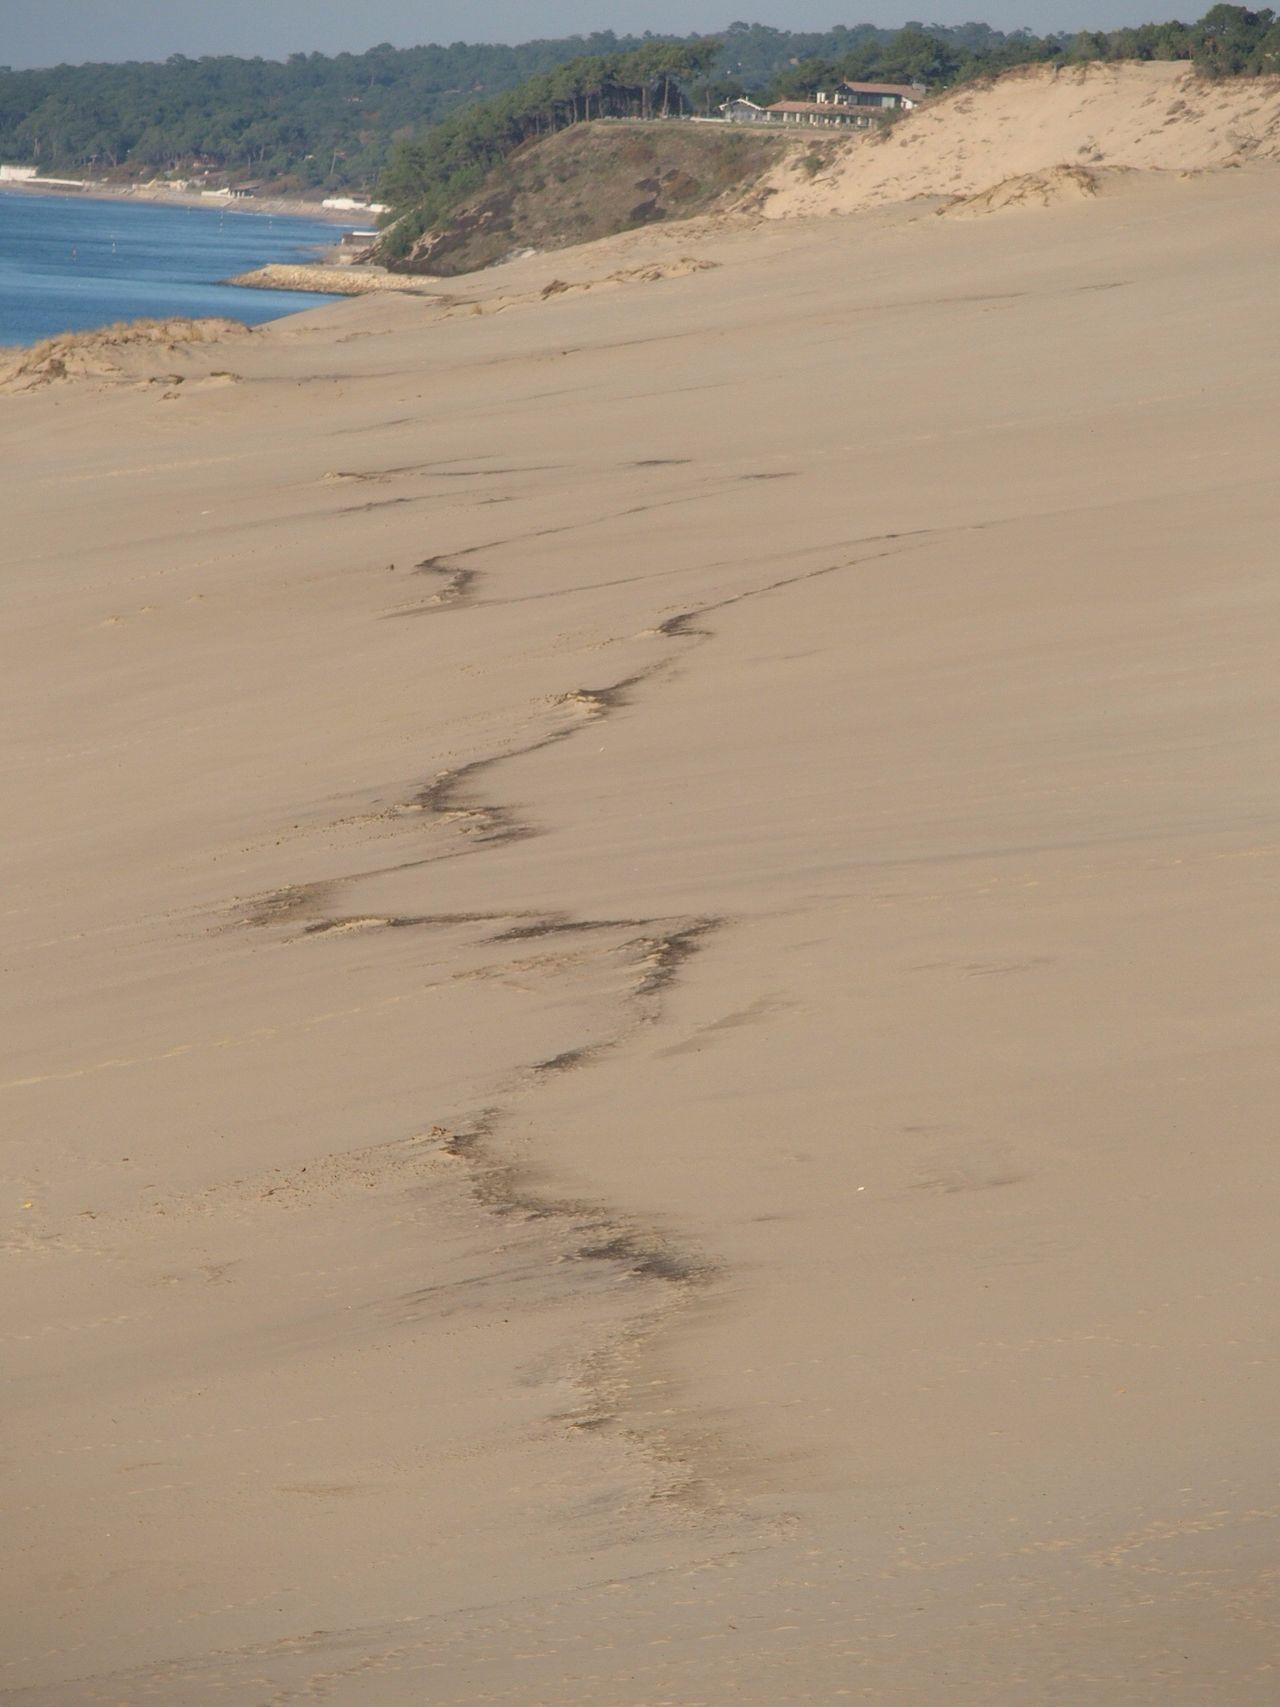 Beach Sea Sand Tranquility Beauty In Nature Water Horizon Over Water No People Dune Dune Du Pilat Arcachon Autumn Colors Dunes Dunedupilat Dunescape Dune Du Pyla Nice Day Outdoors Tranquil Scene